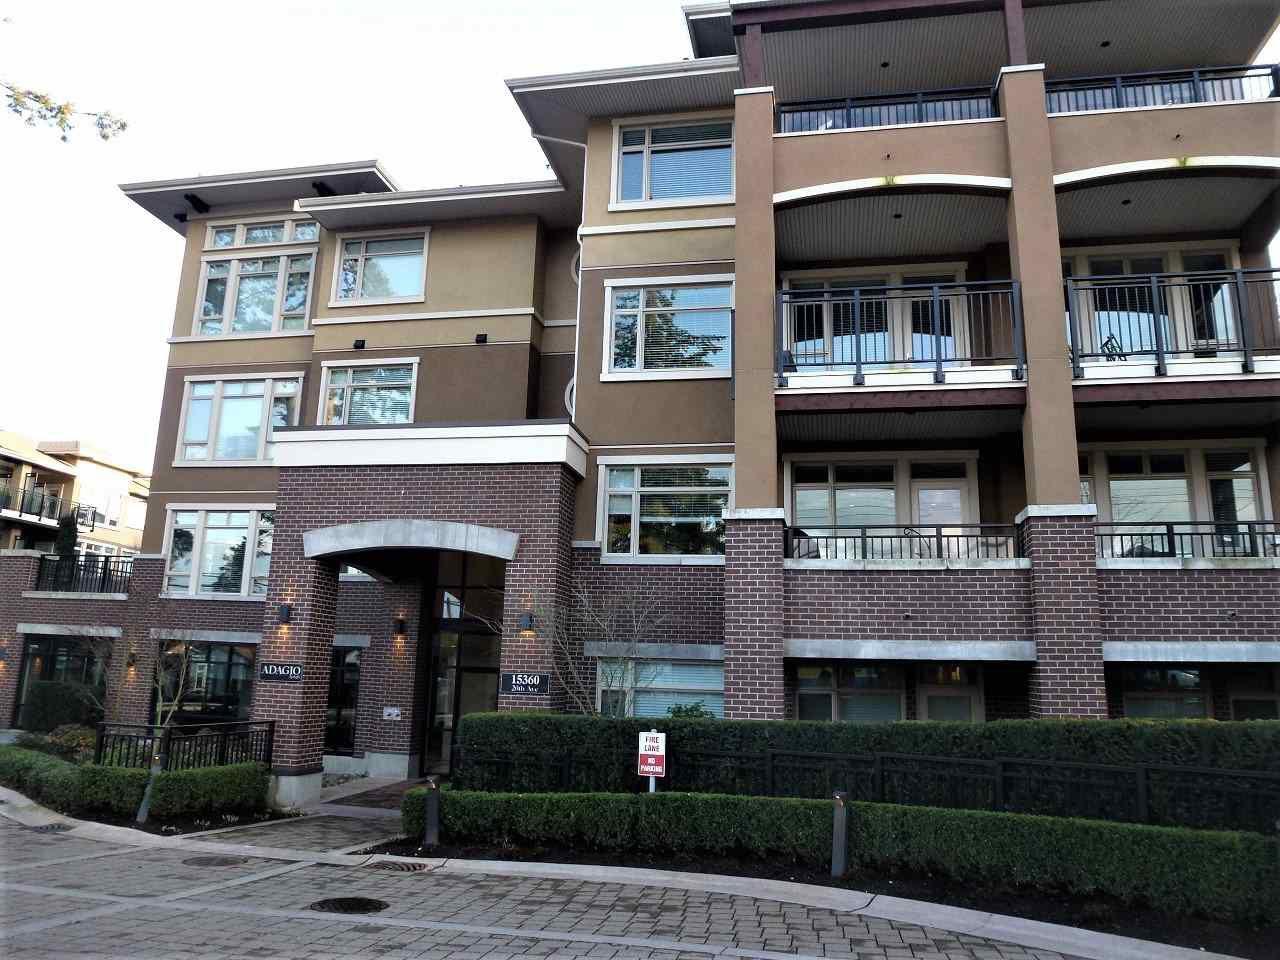 "Main Photo: 306 15360 20 Avenue in Surrey: King George Corridor Condo for sale in ""ADAGIO"" (South Surrey White Rock)  : MLS®# R2150727"